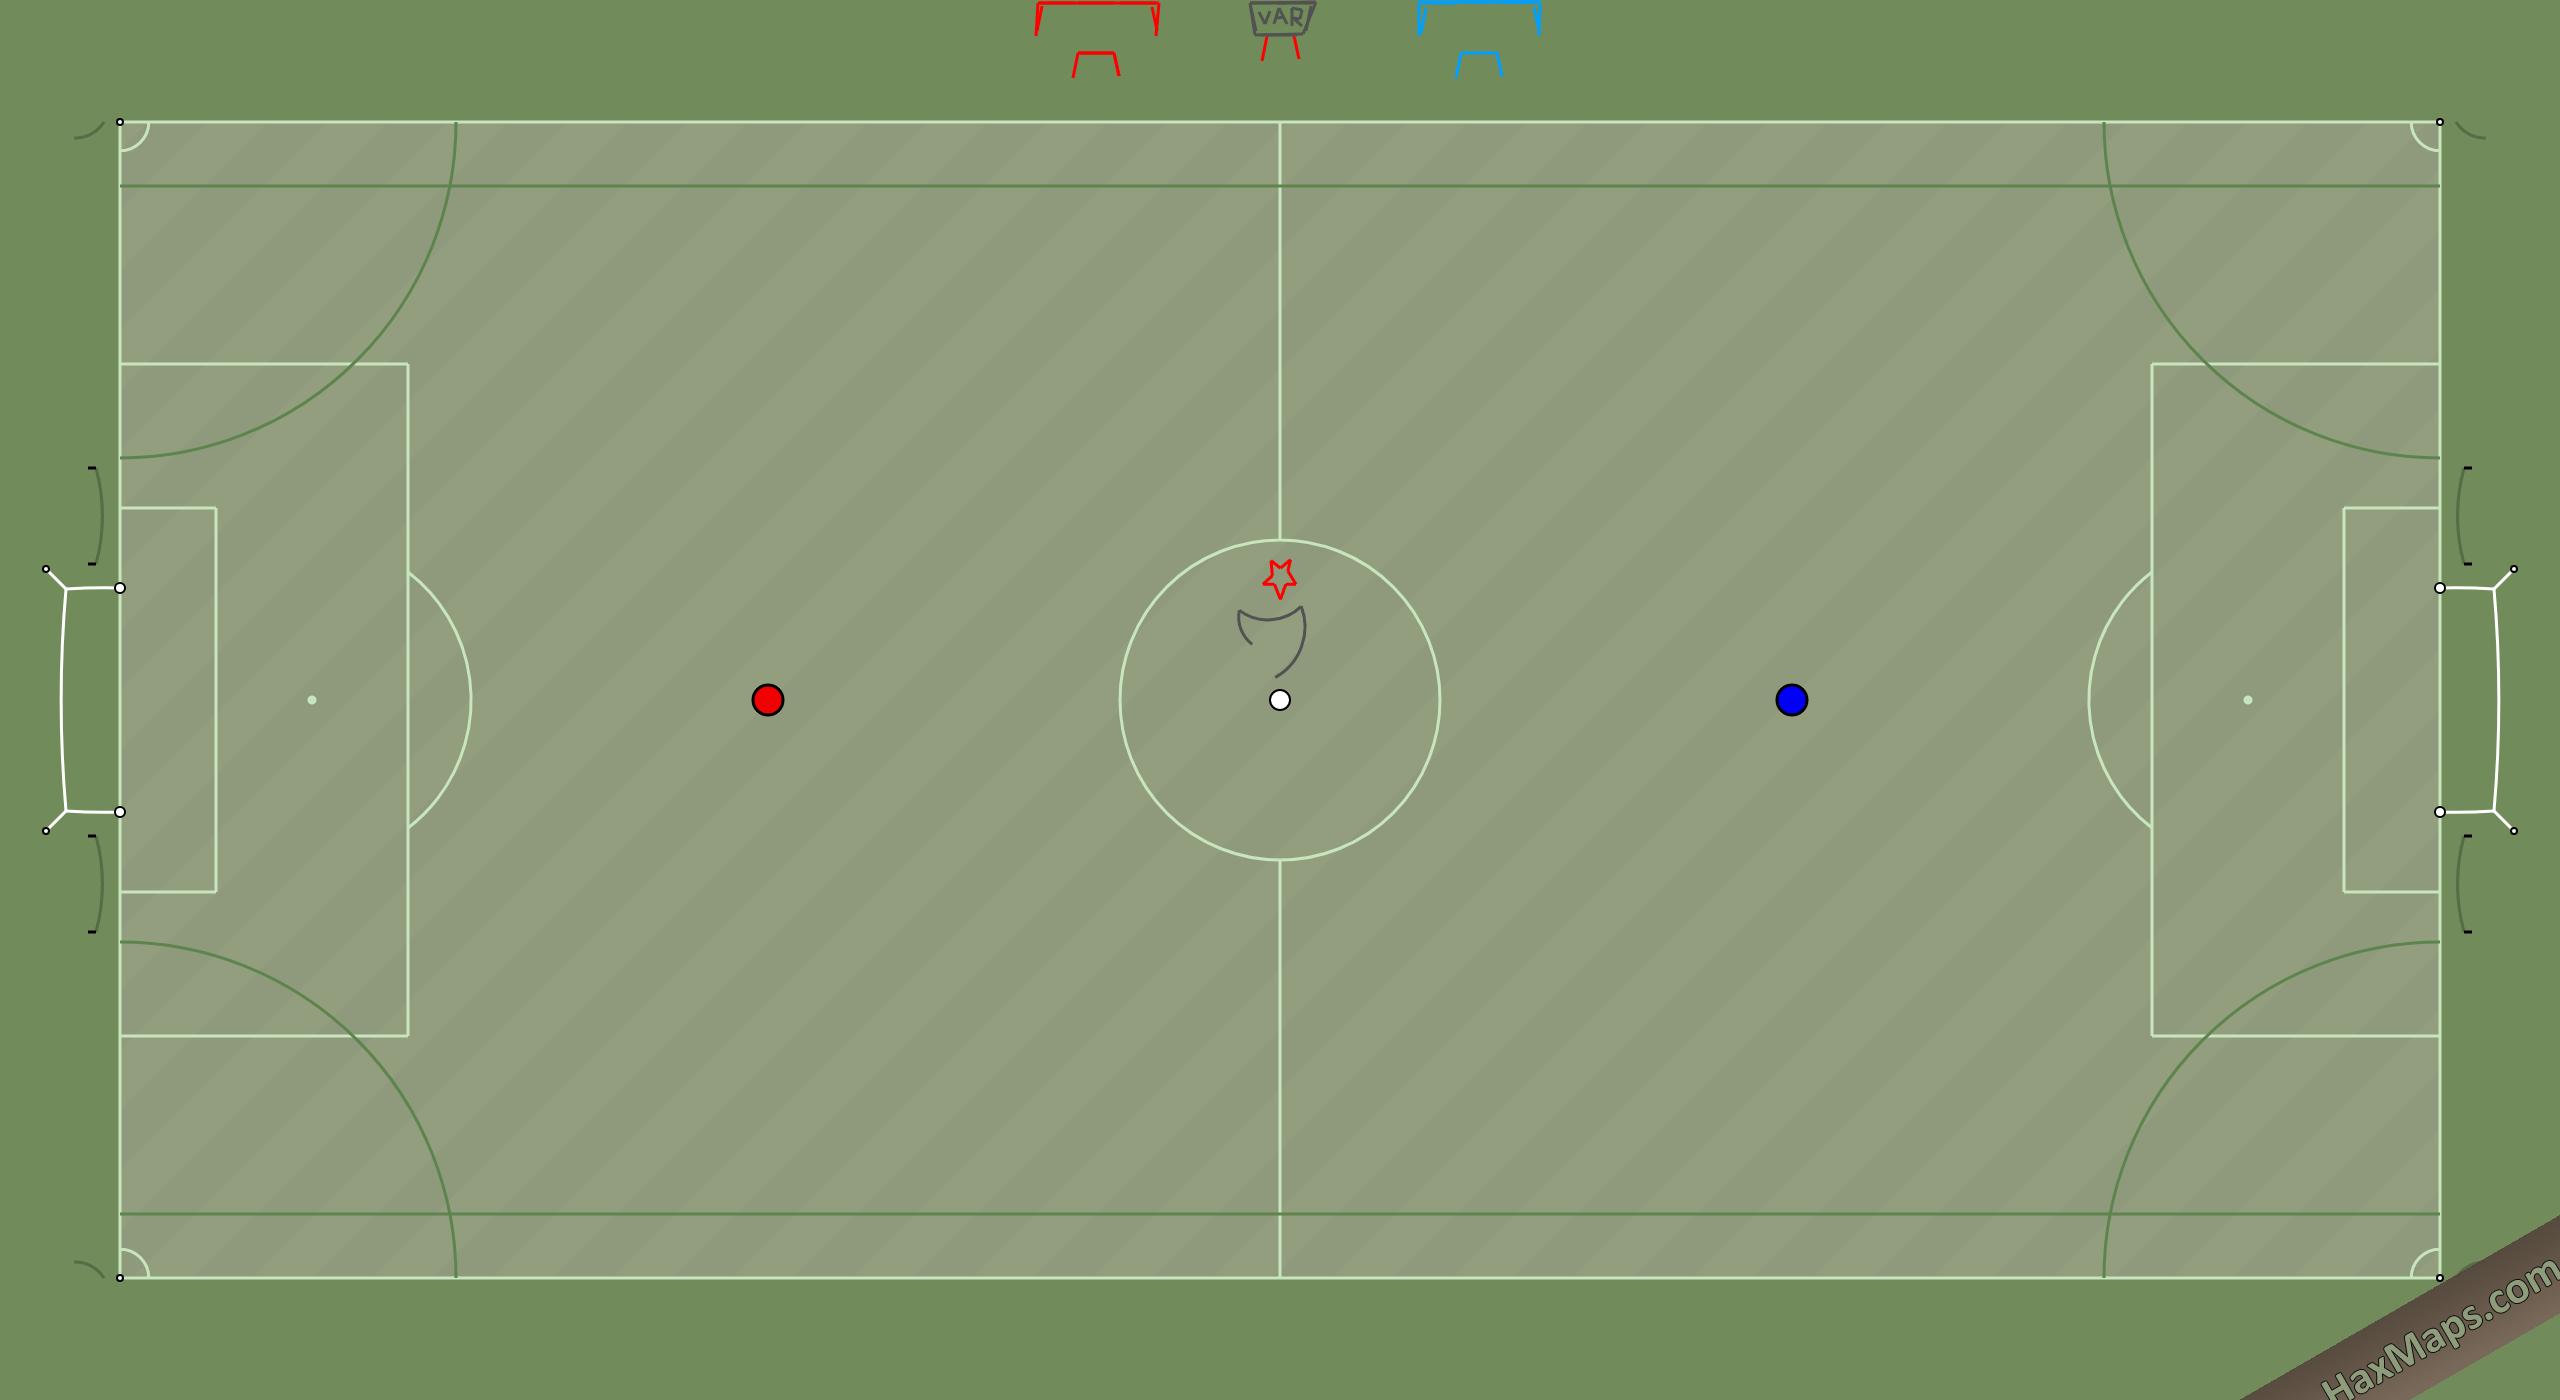 hax ball maps   mandarin v4 rs hakemli süper lig by Emir